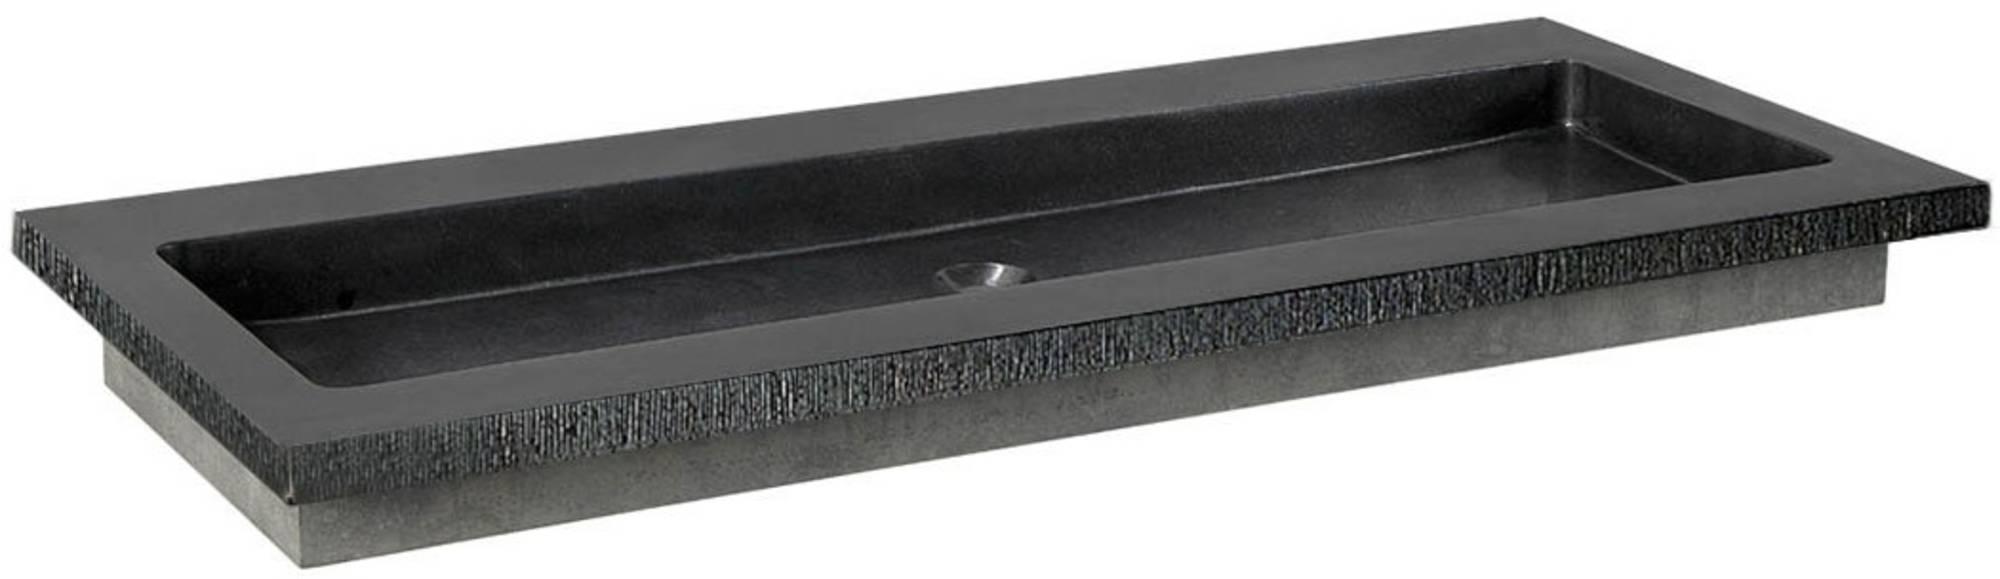 Ben Naturno Wastafel Graniet Gezoet Gefrijnd 100,5x51,5x3 cm 2 Krg. Zwart